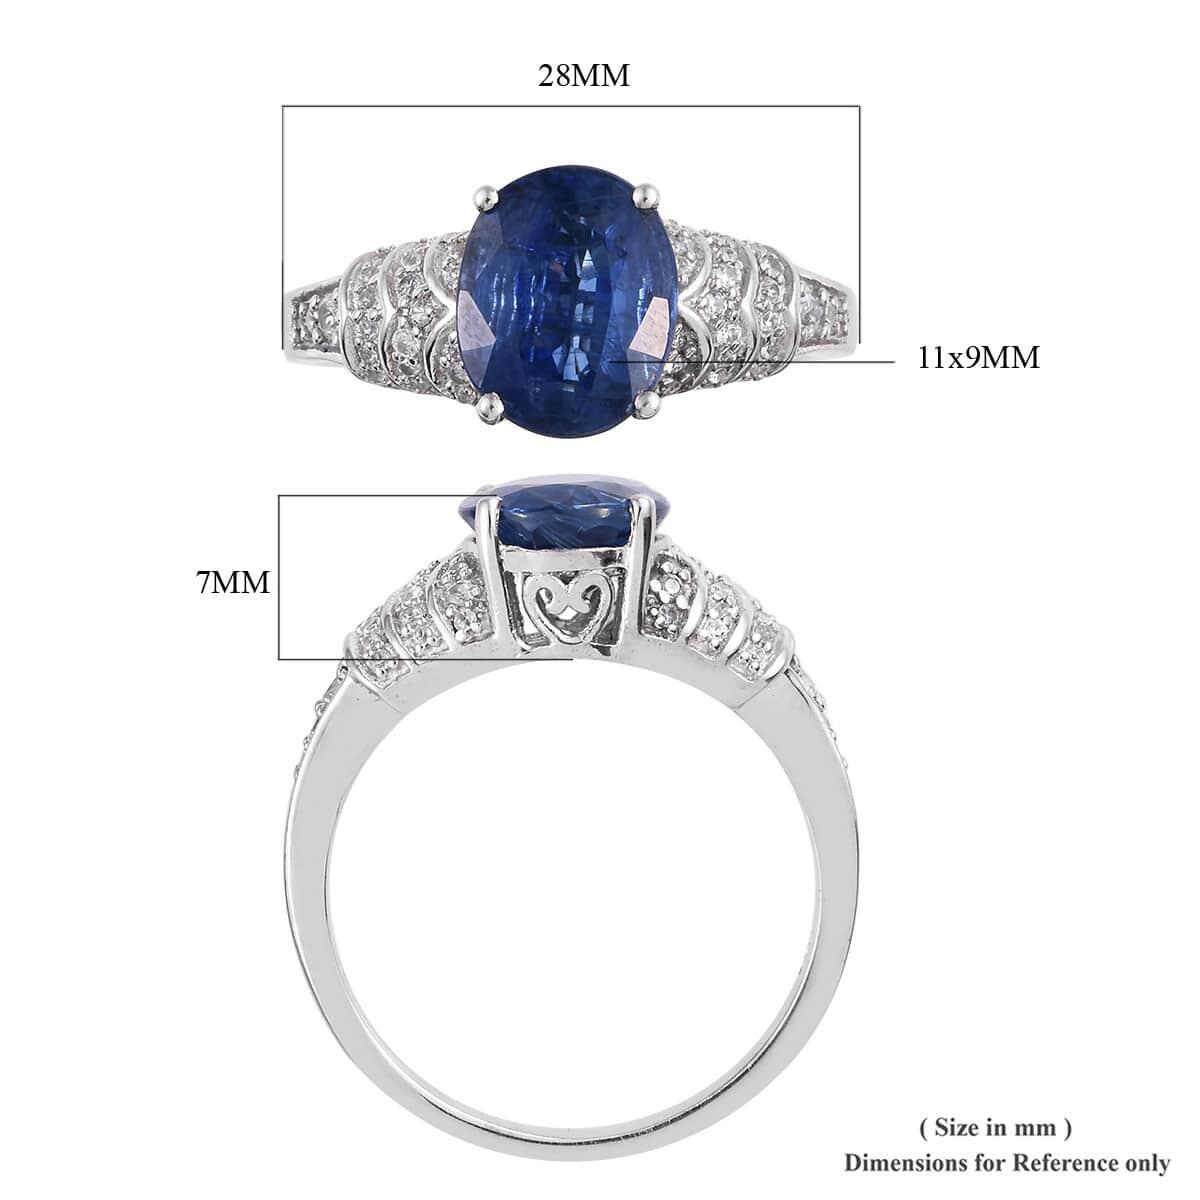 Kashmir Kyanite, Cambodian Zircon Ring in Platinum Over Sterling Silver (Size 8.0) 4.80 ctw